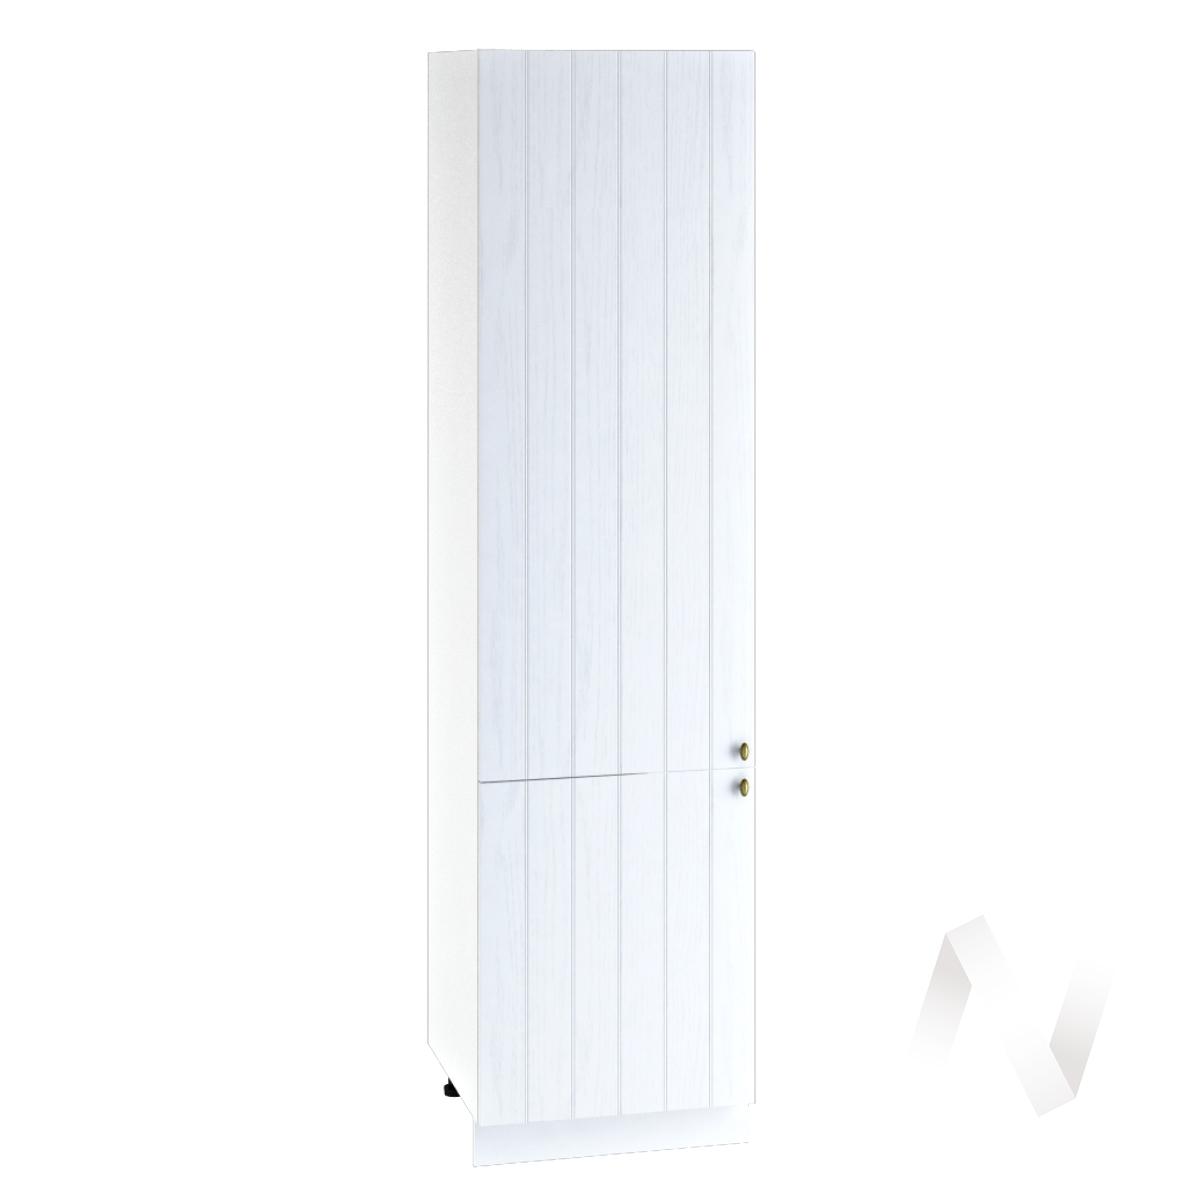 "Кухня ""Прованс"": Шкаф пенал 600, ШП 600НМ (белое дерево/корпус белый)"